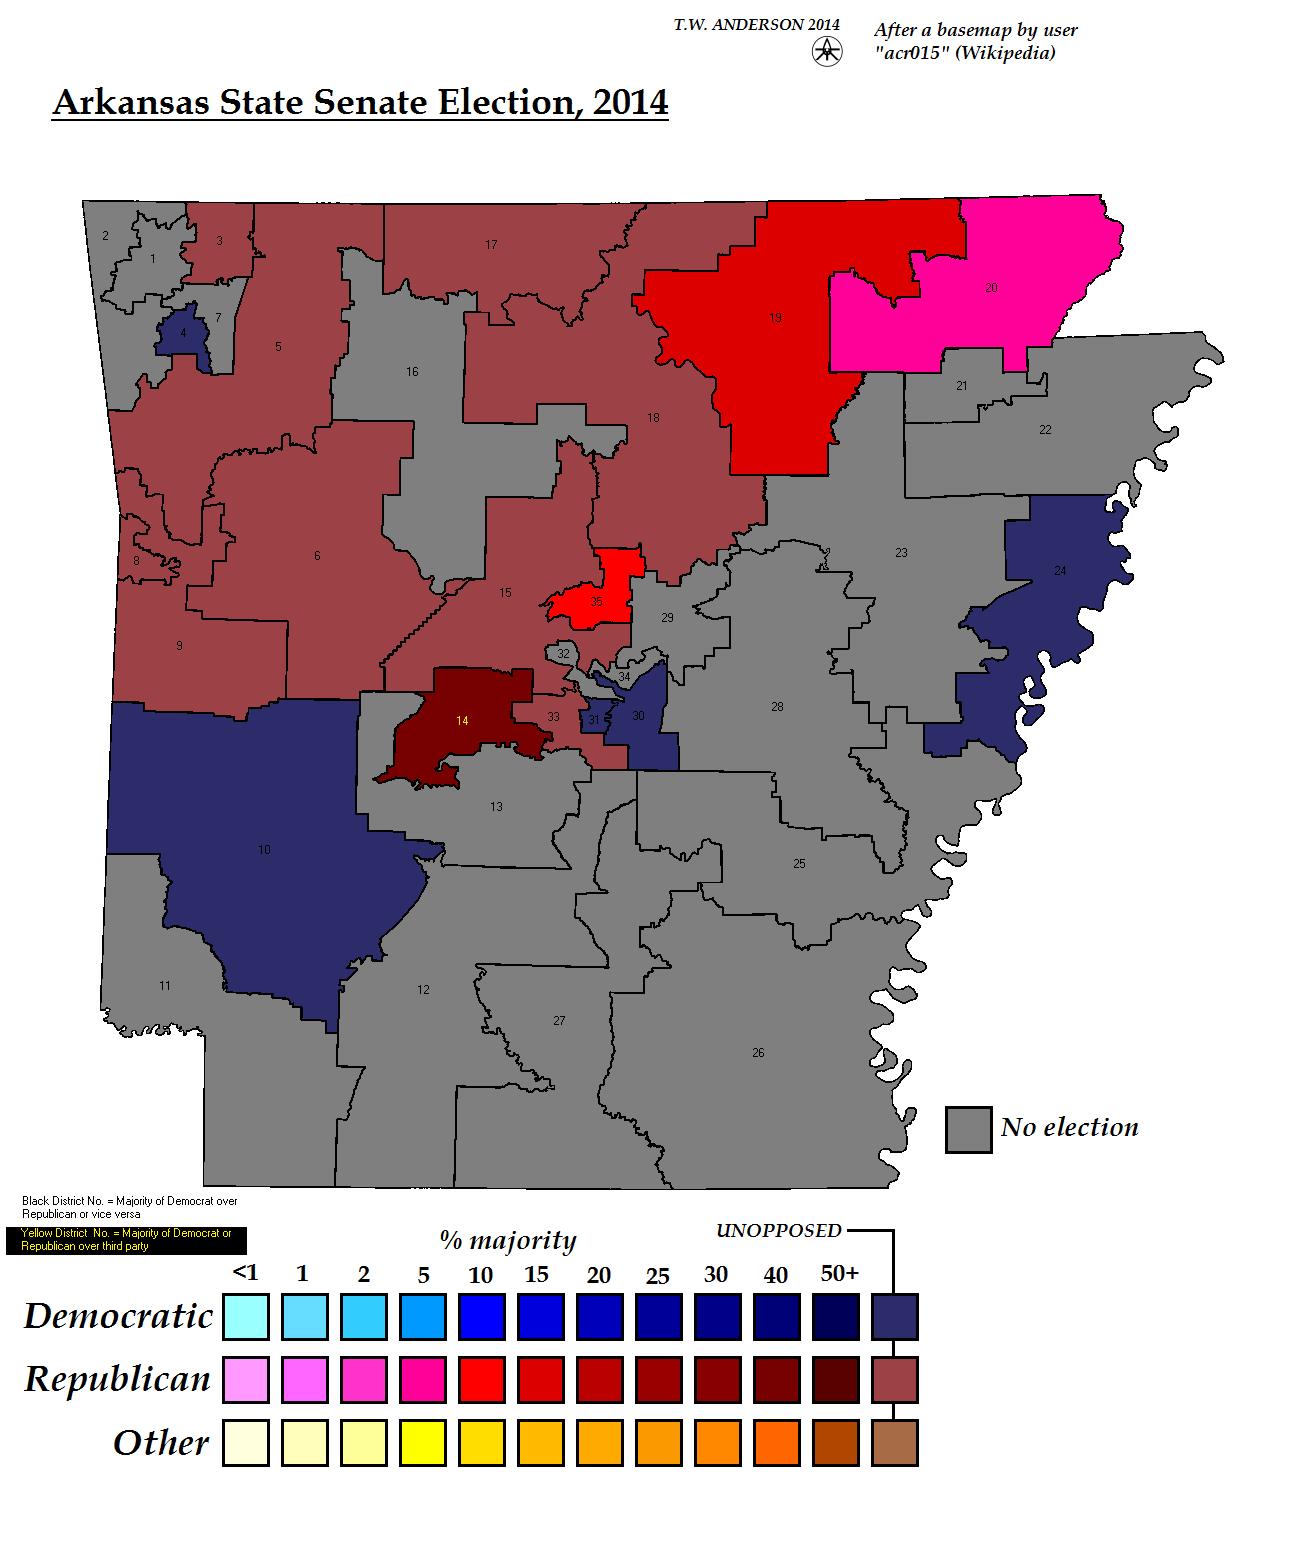 Arkansas State Senate Election 2014